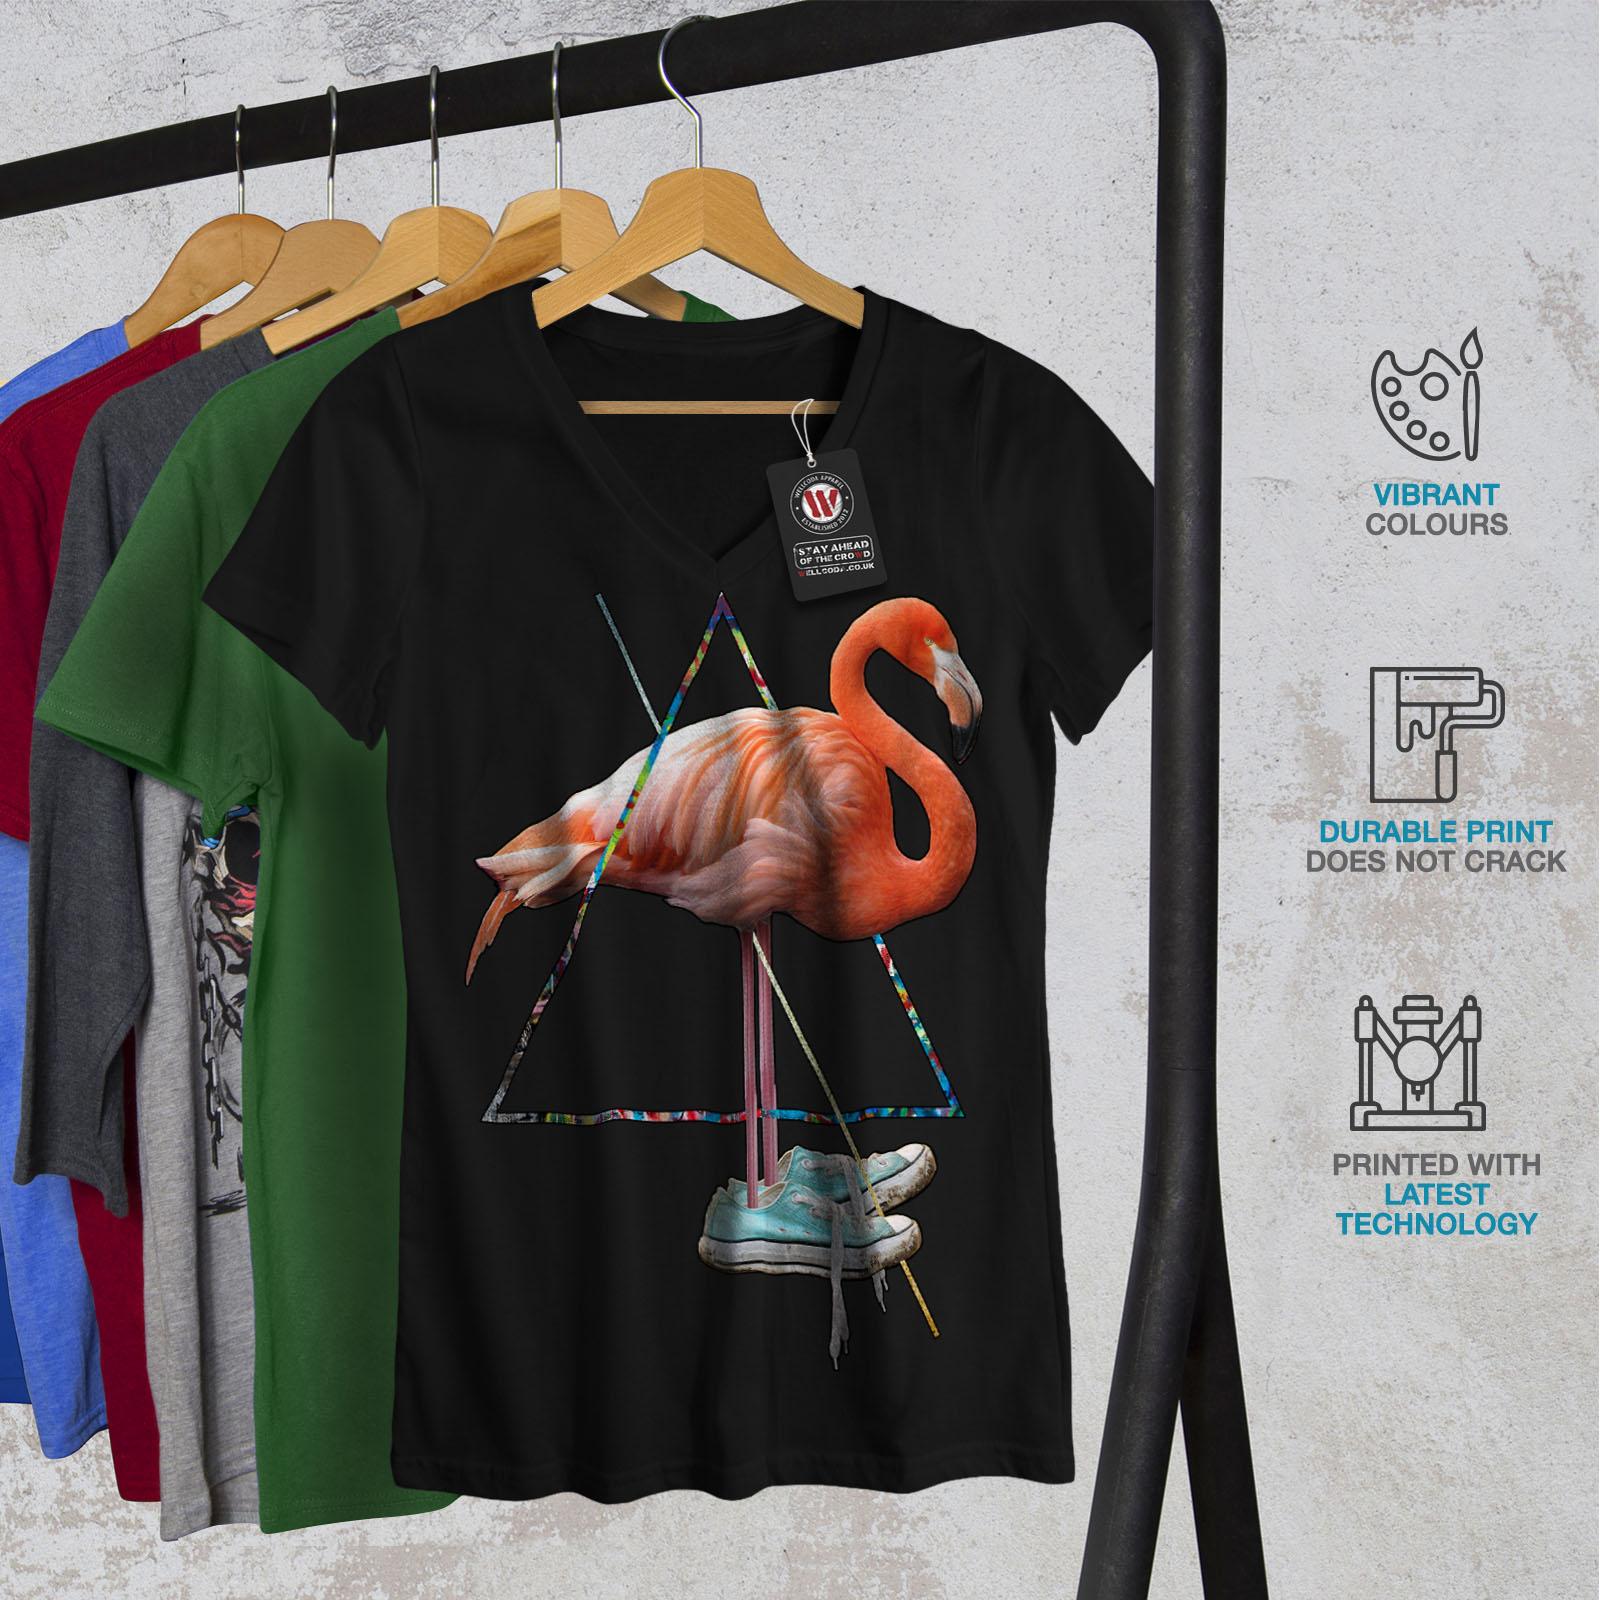 Wellcoda-Flamingo-Bird-Shoe-Womens-V-Neck-T-shirt-Sneaker-Graphic-Design-Tee thumbnail 4